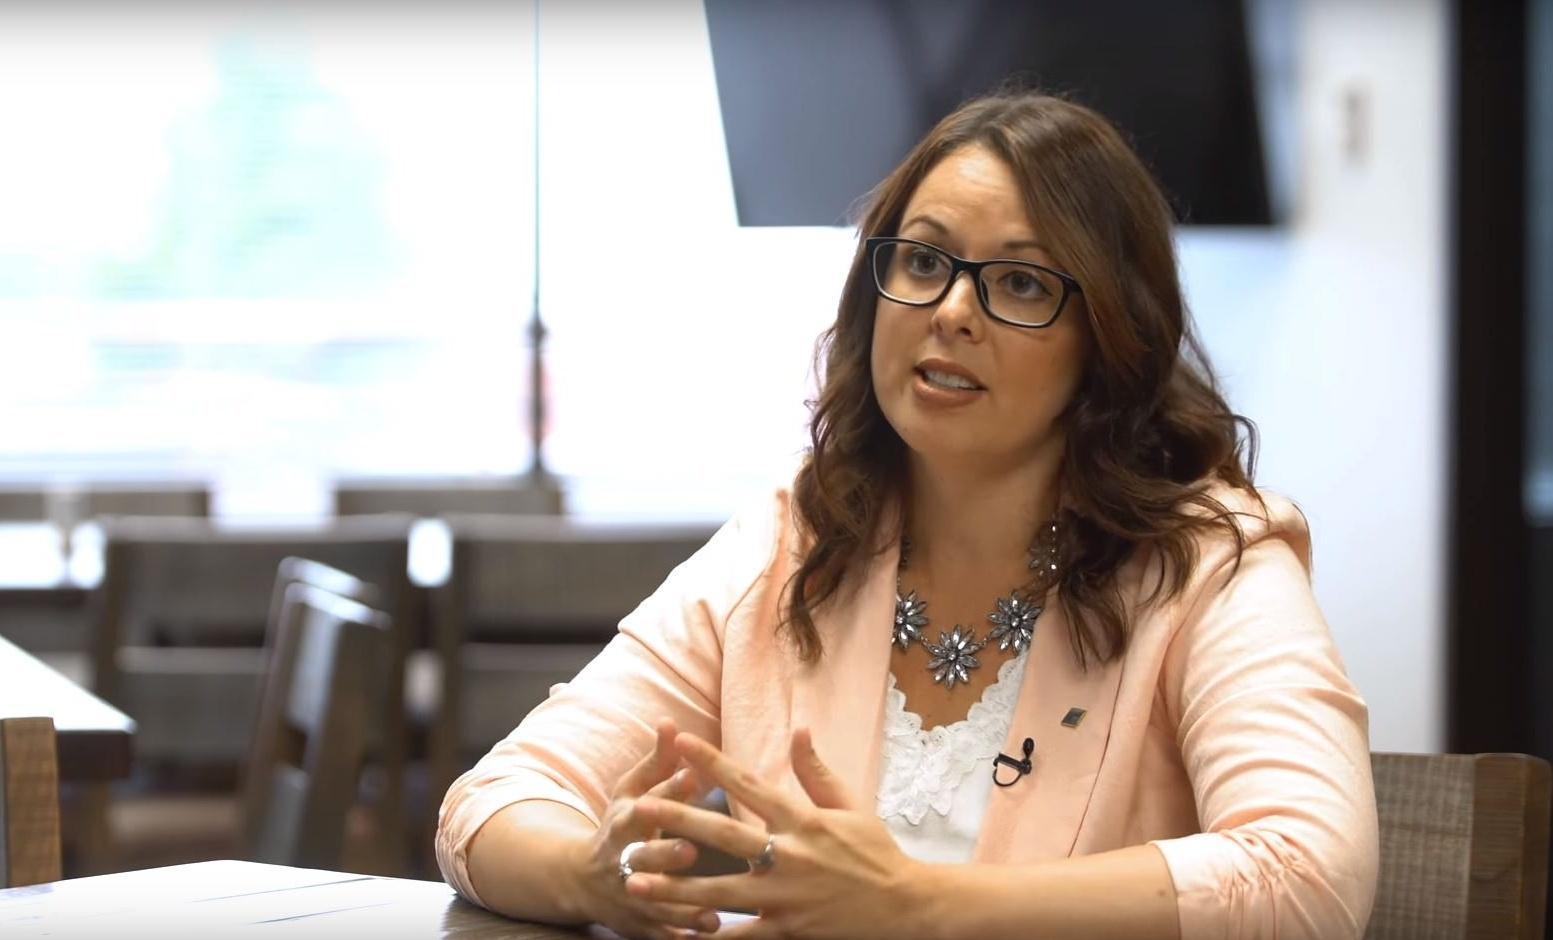 Stearns Bank employee spotlight videos